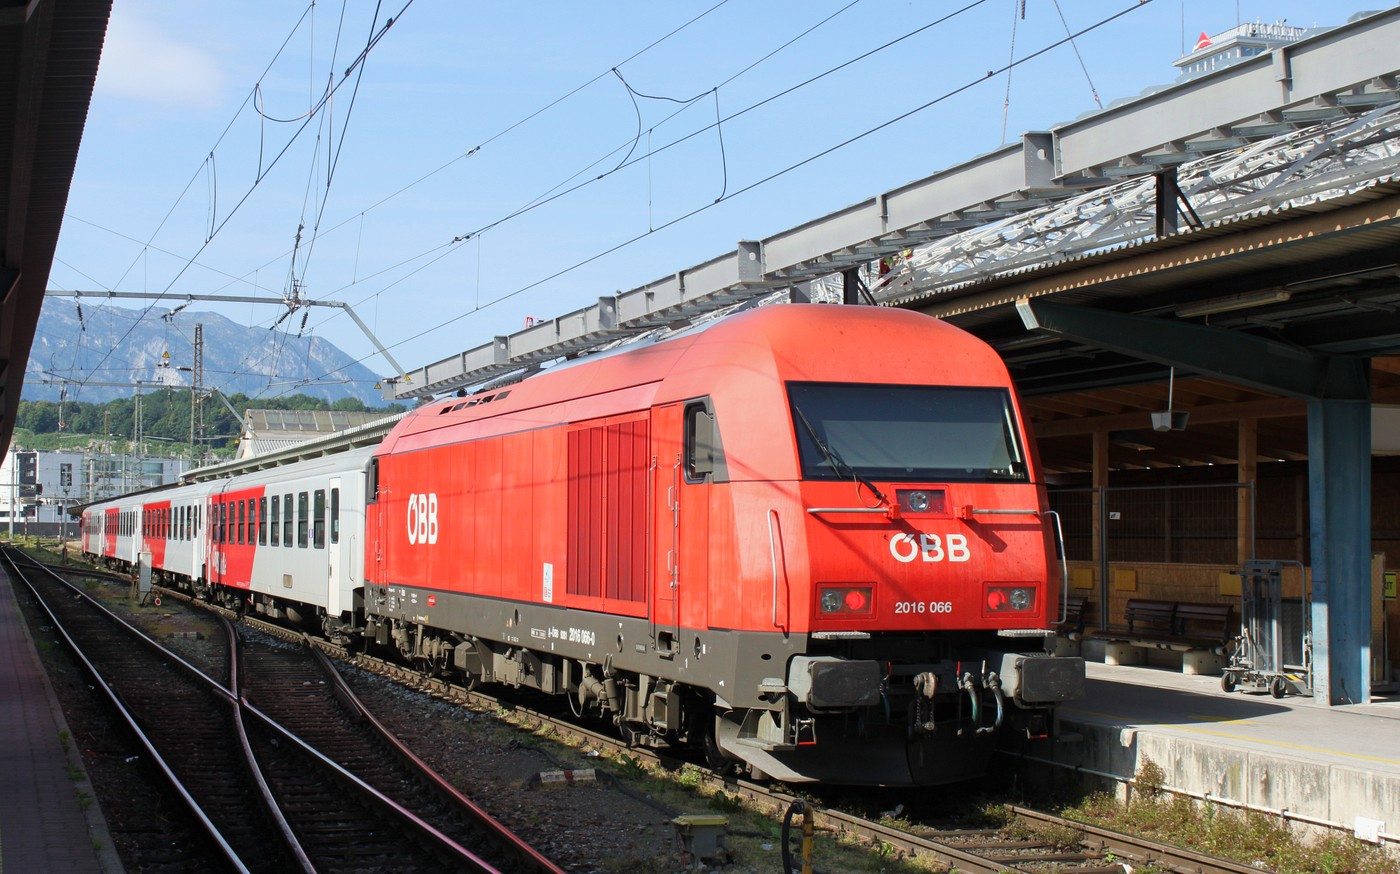 http://www.eisenbahn-im-bild.de/Temp/A_Salzburg_IMG_1021.jpg